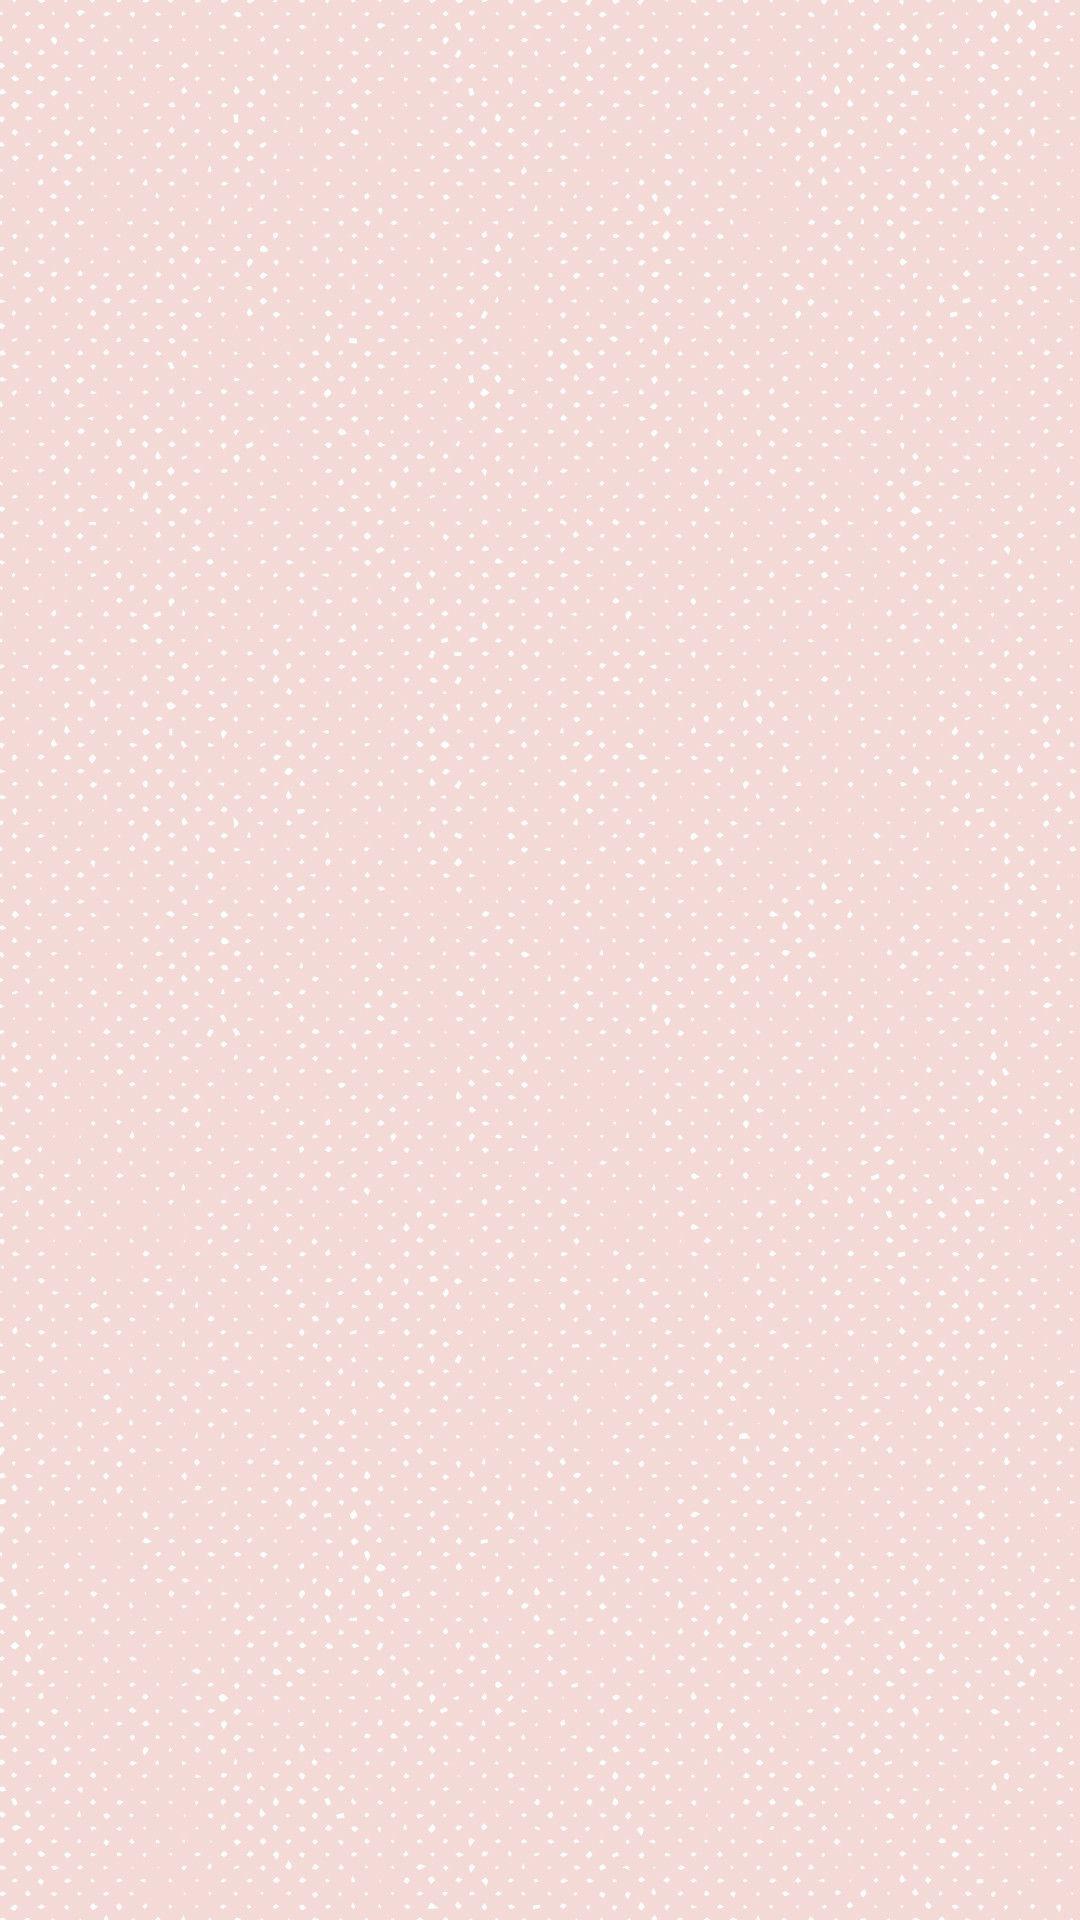 Pink wallpaper tumblr gallery